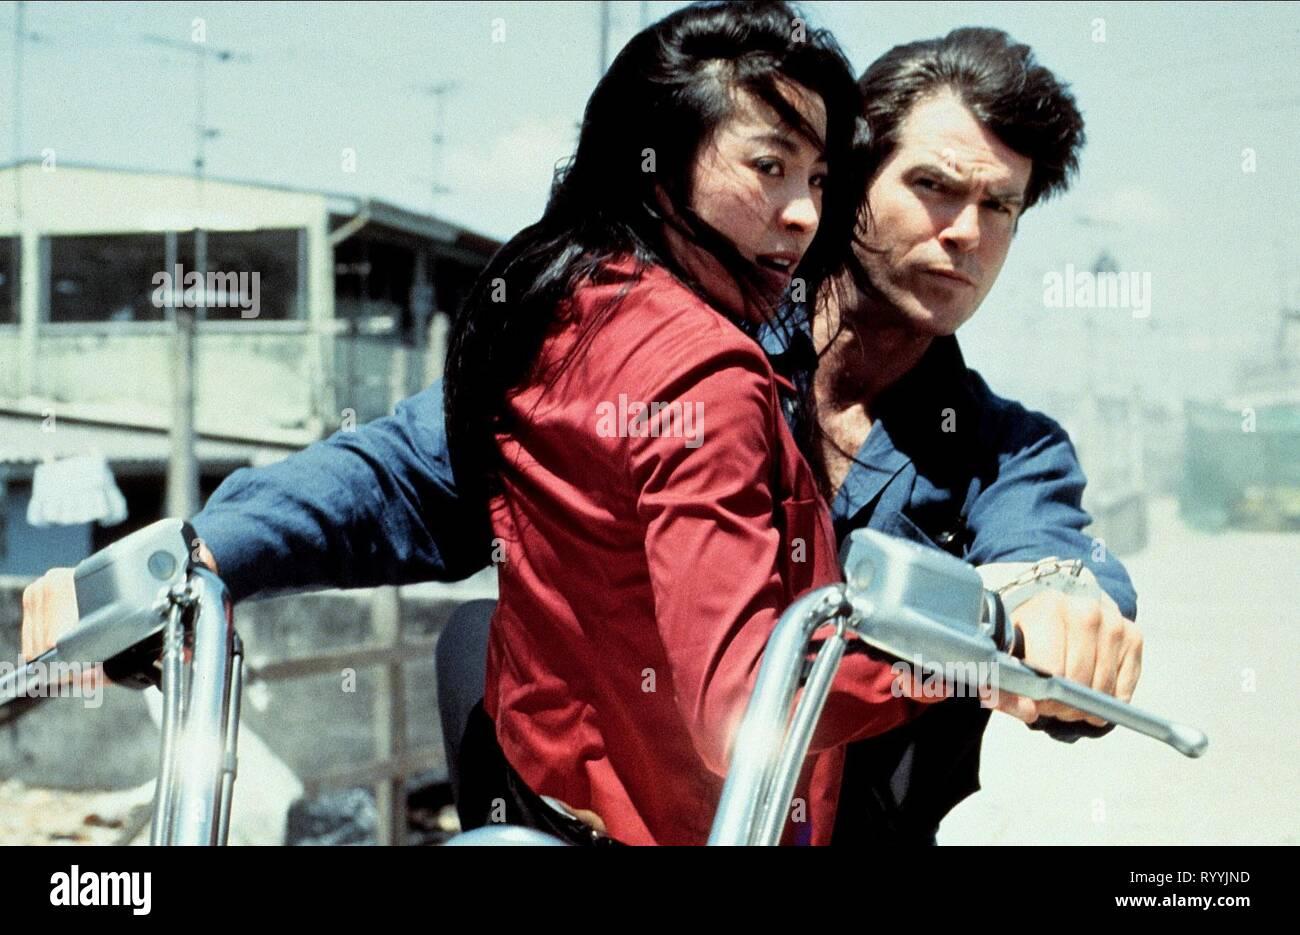 Michelle Yeoh Pierce Brosnan Tomorrow Never Dies 1997 Stock Photo Alamy